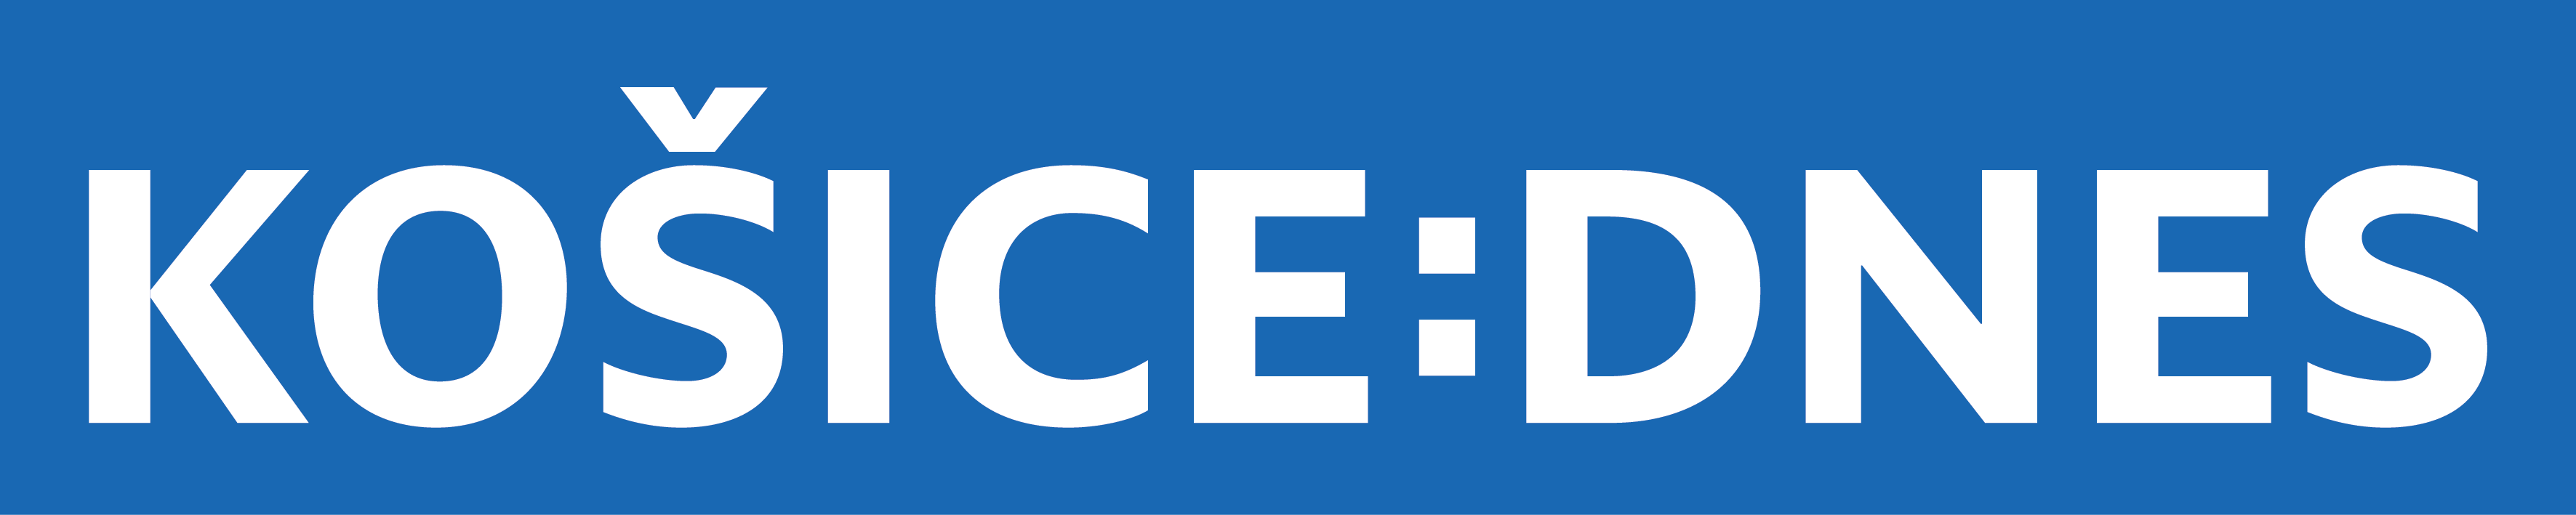 kd-new-logo_kosicednes-dennik-invert